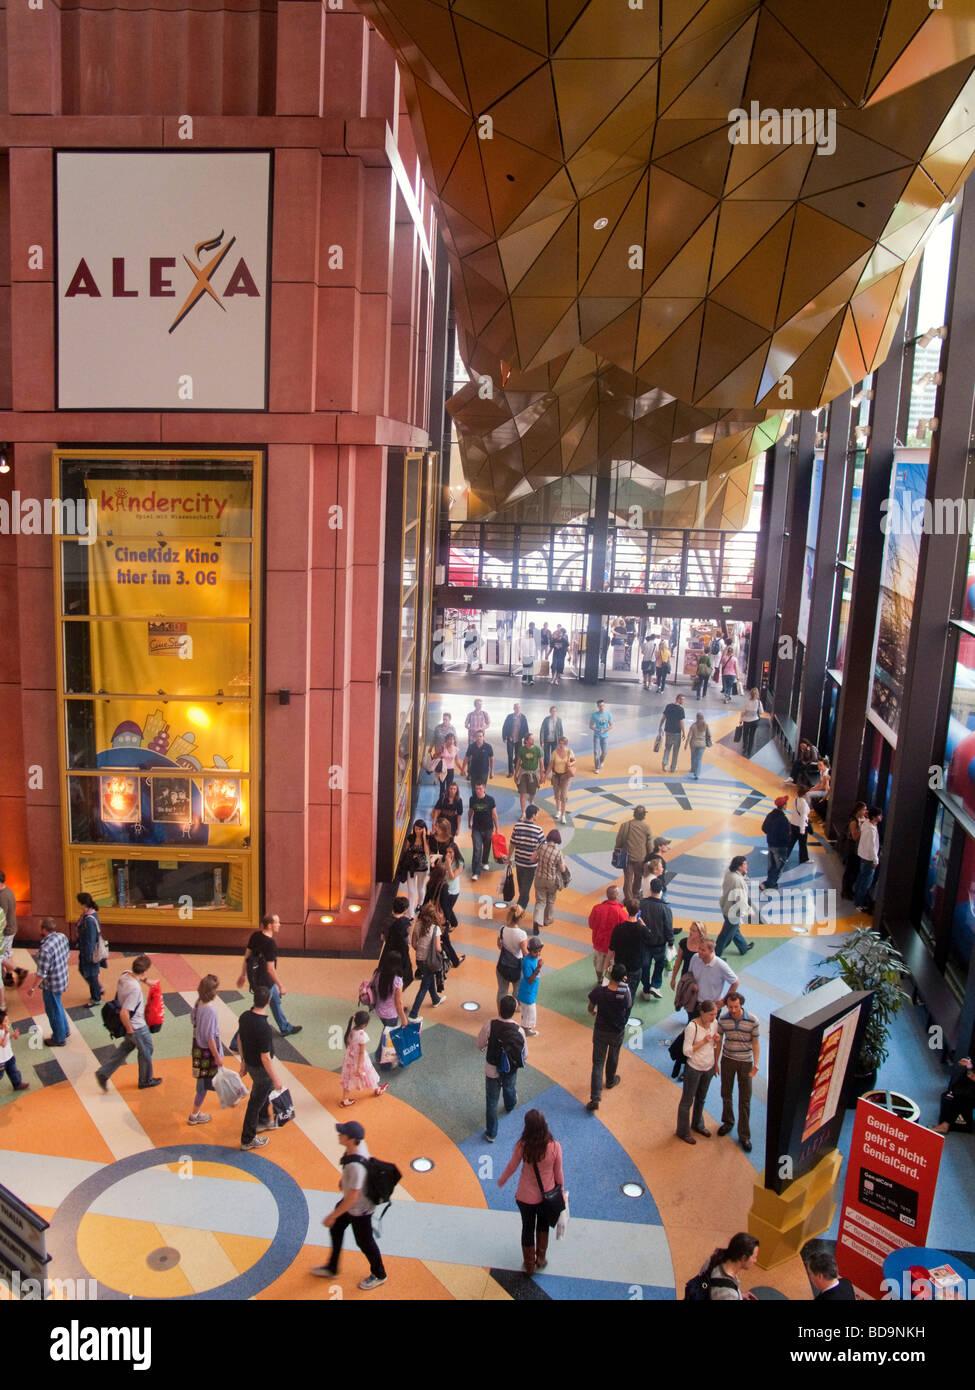 Berlin Alexa shopping center Alexander square Berlin Germany  - Stock Image